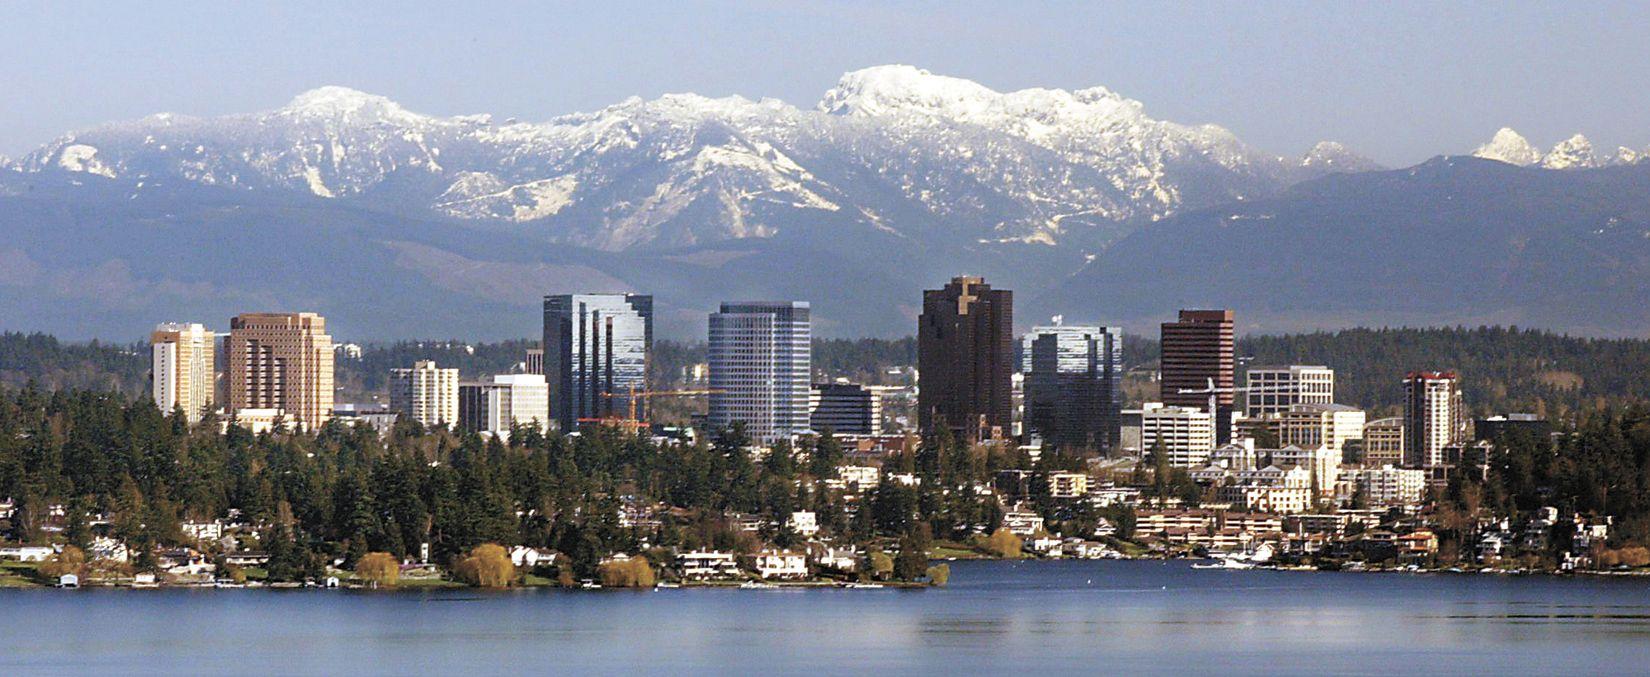 From Seattle Looking East Across Lake Washingoton To